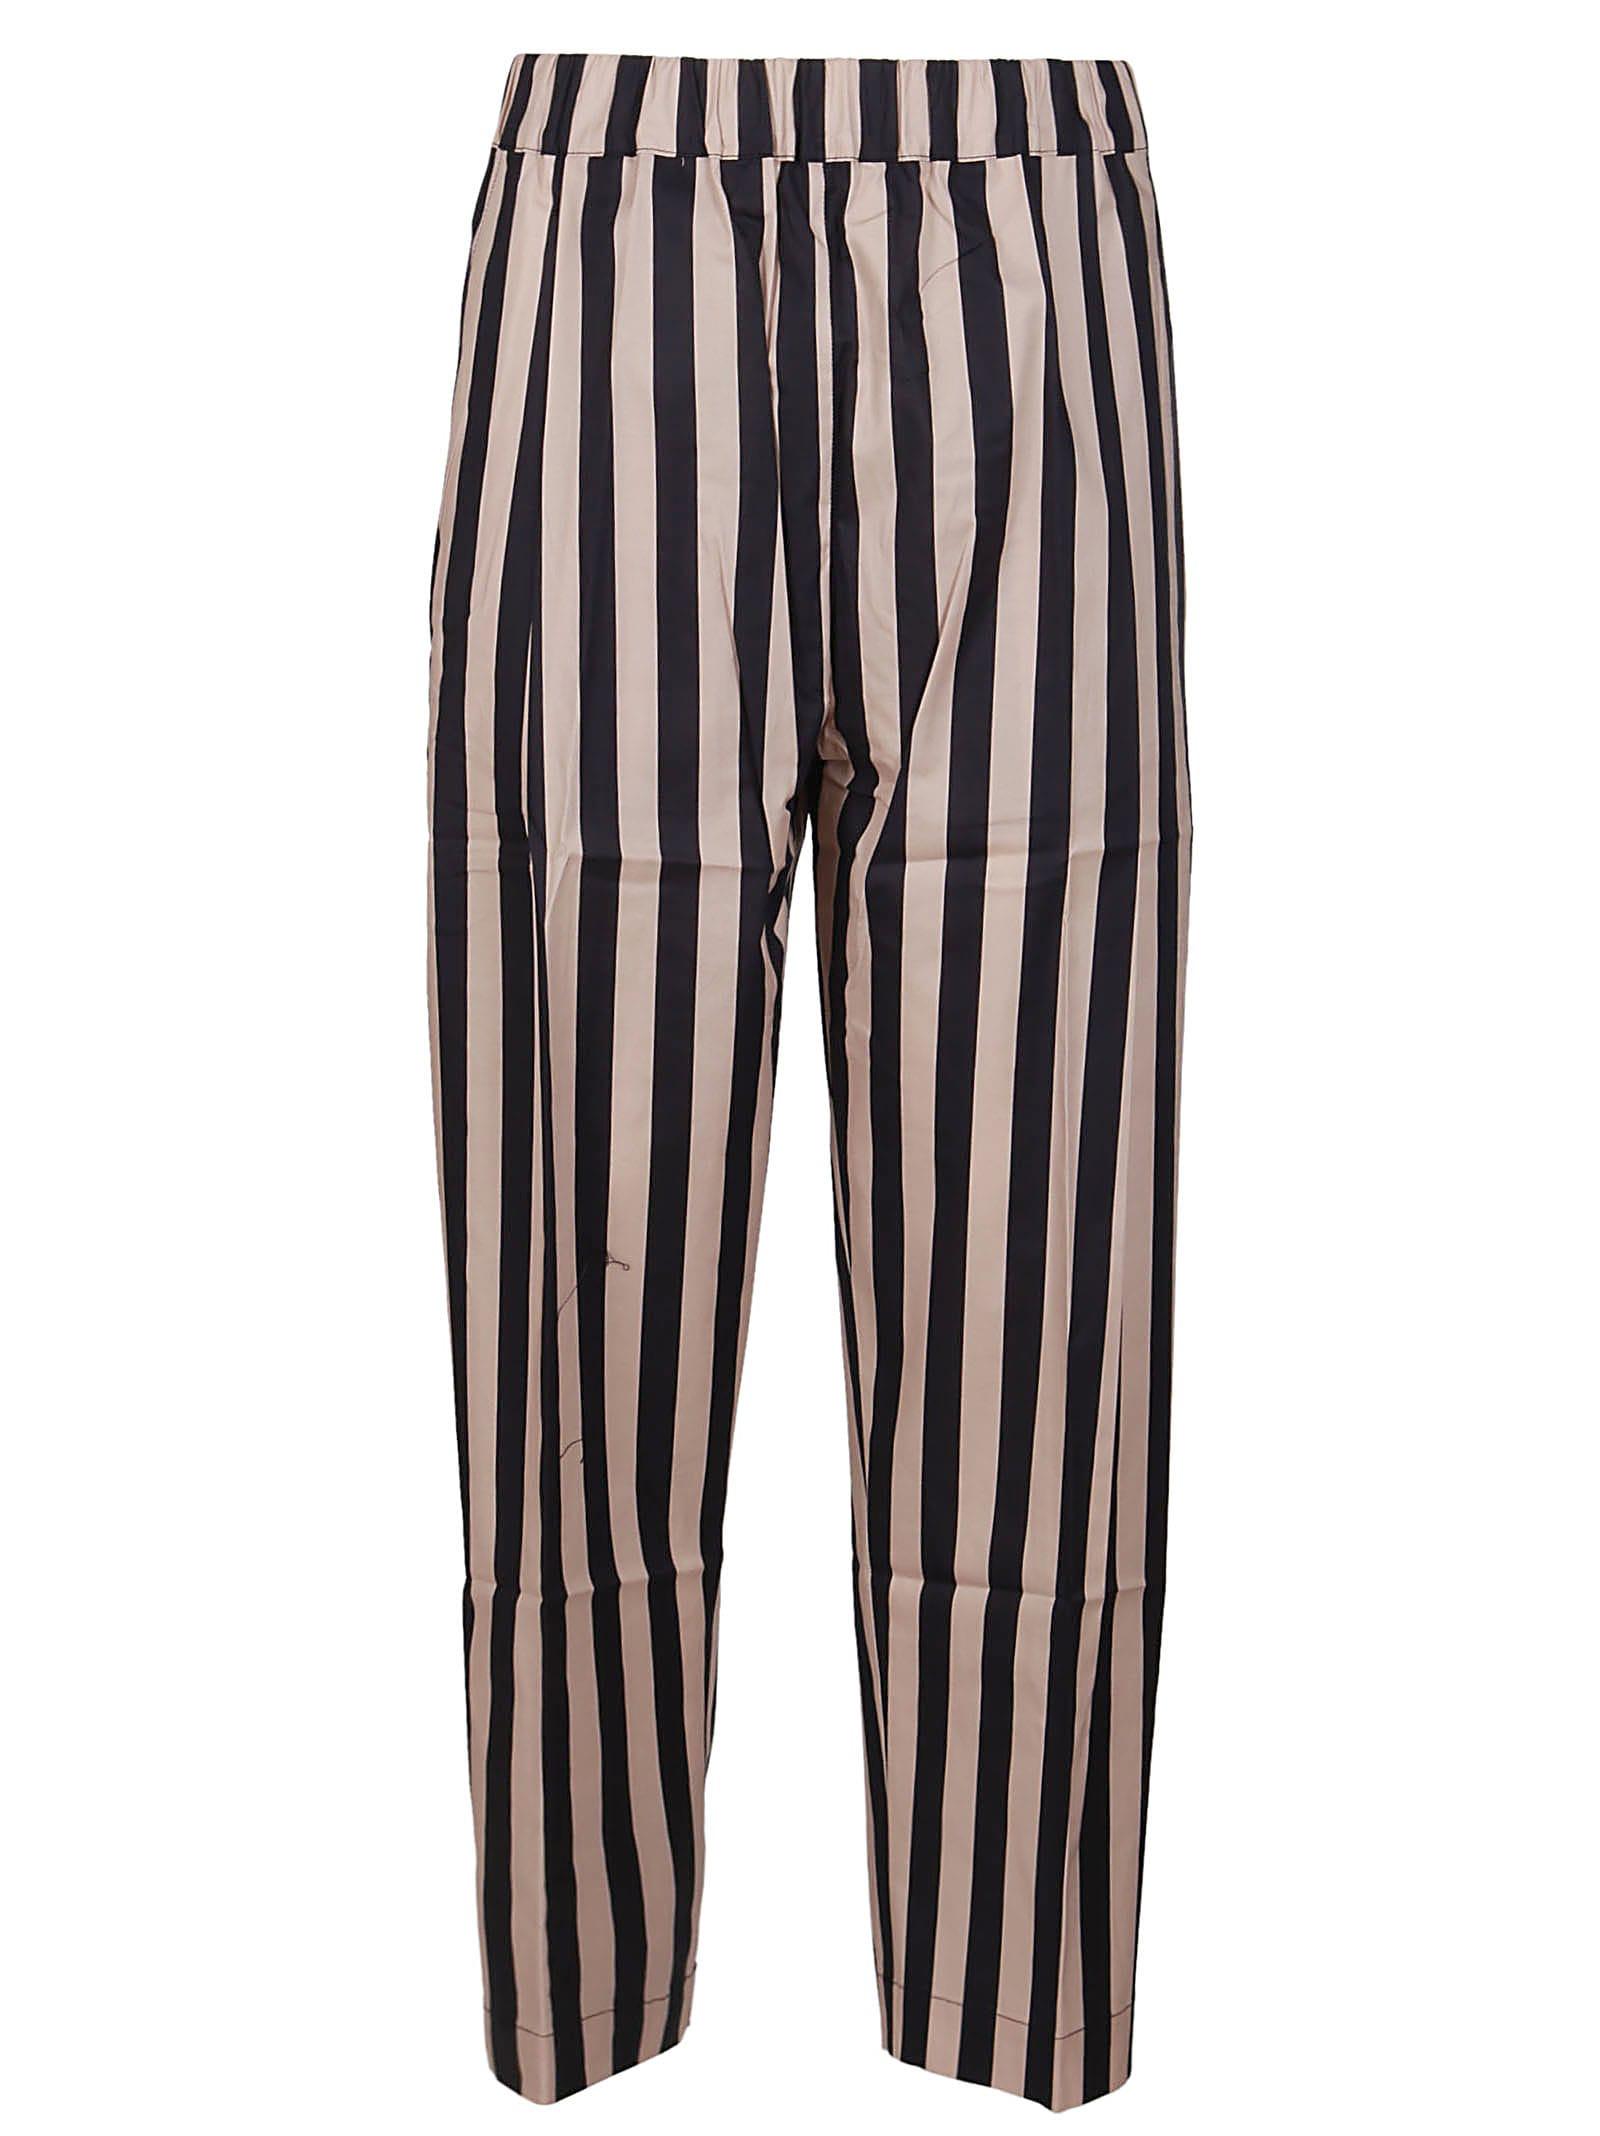 Laneus Straight pants BLACK AND BEIGE COTTON TROUSERS